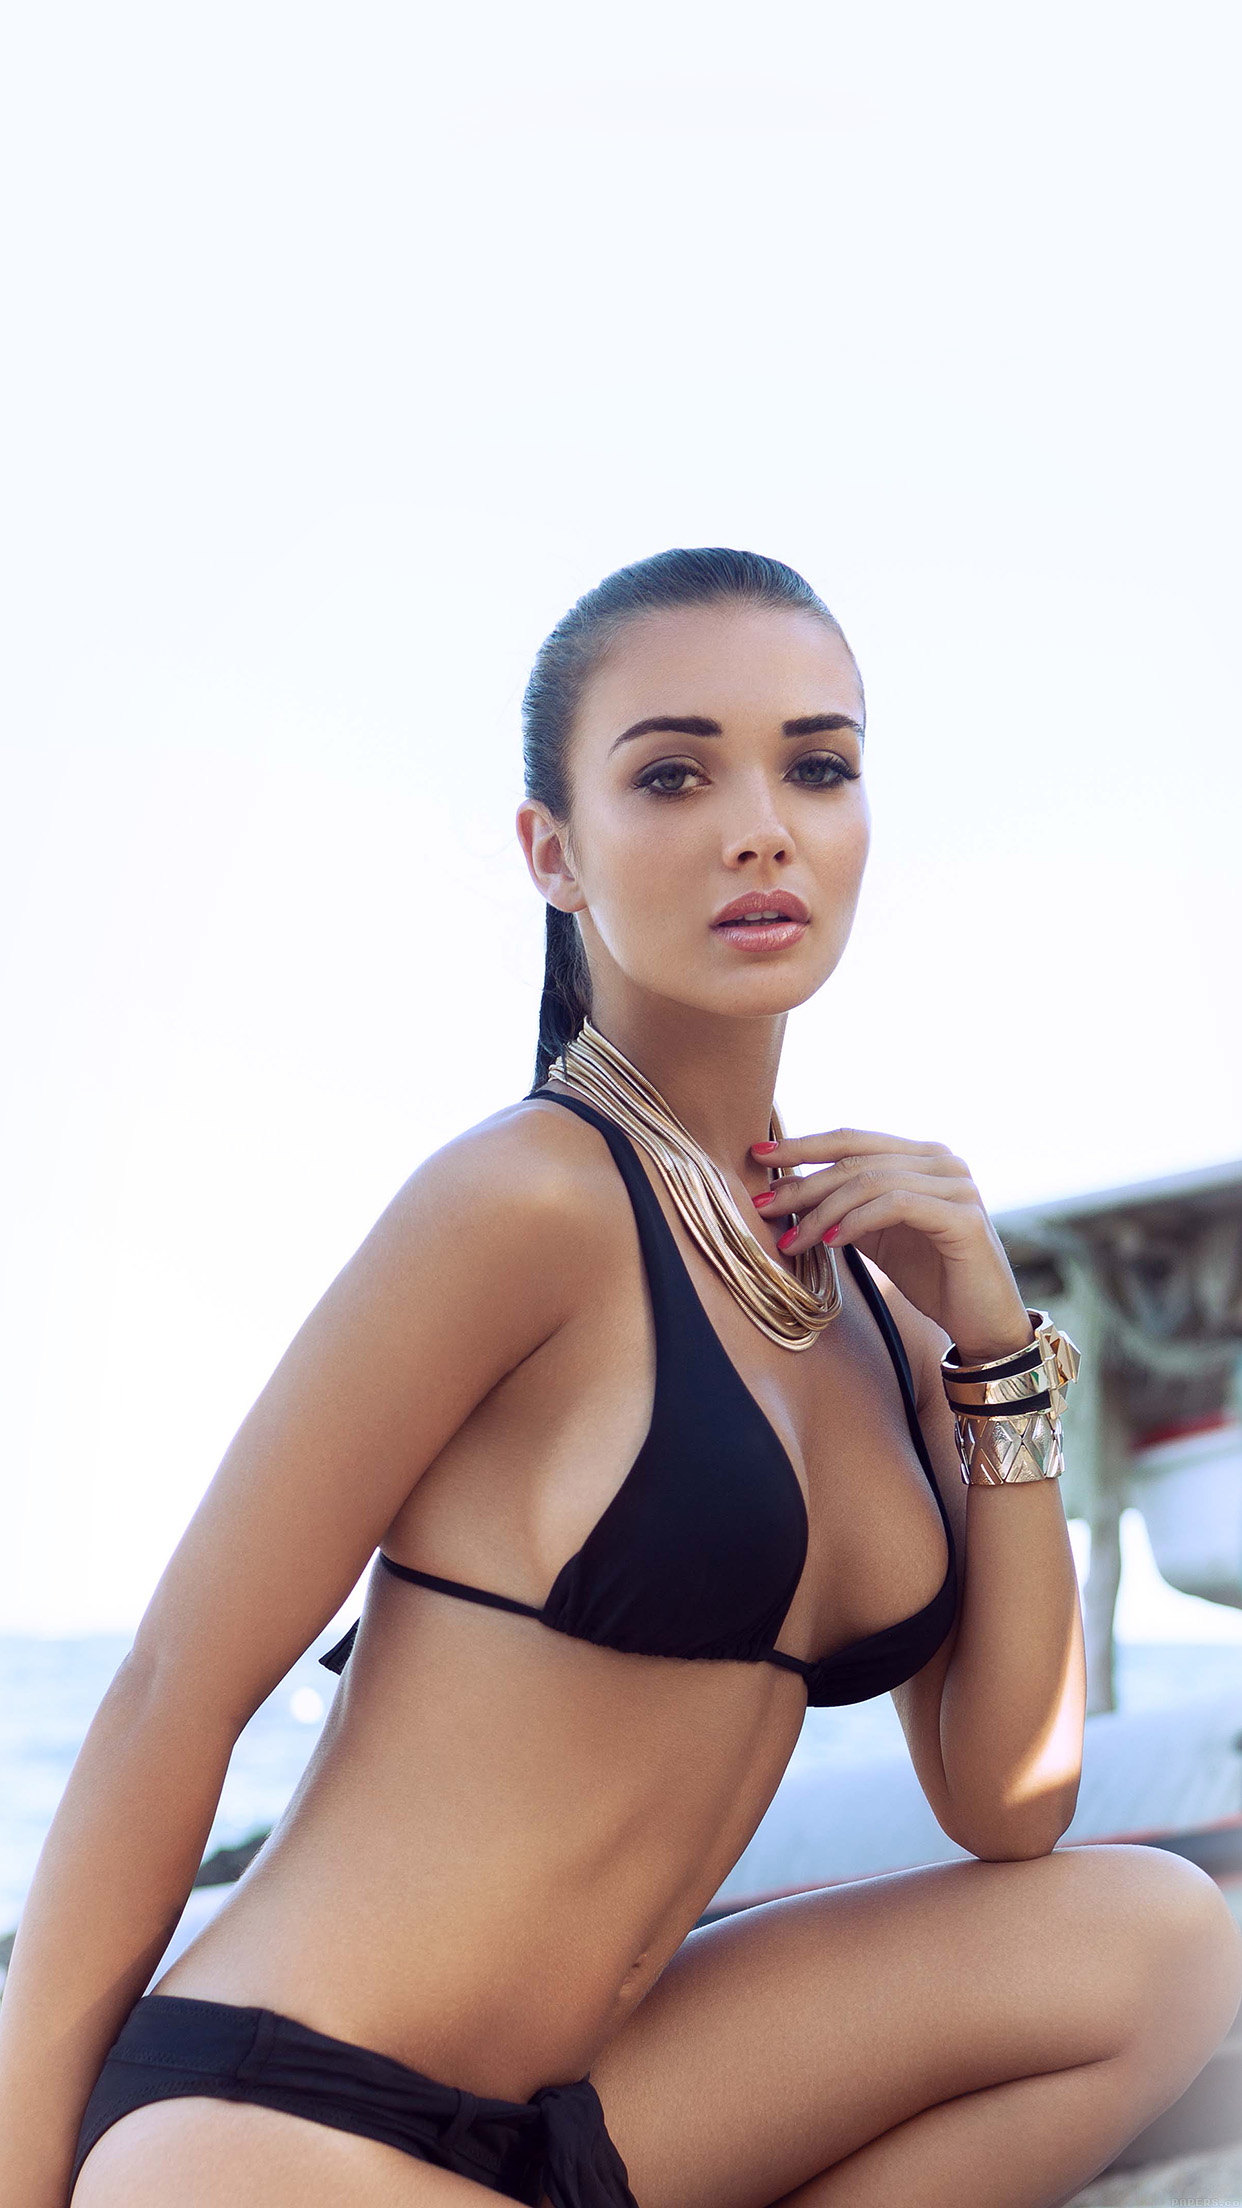 Iphone7papers Hd63 Amy Jackson Bikini Sexy Girl